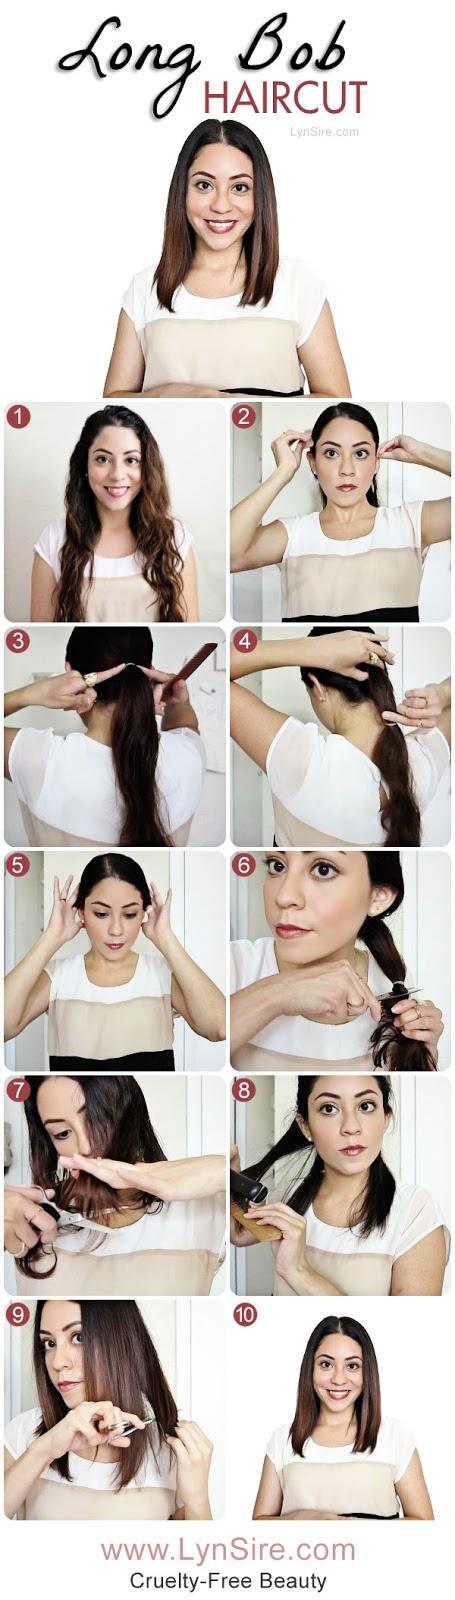 Long Bob Haircut Tutorial! How to Cut Your Own Hair - LynSire.com | Cruelty-Free Beauty